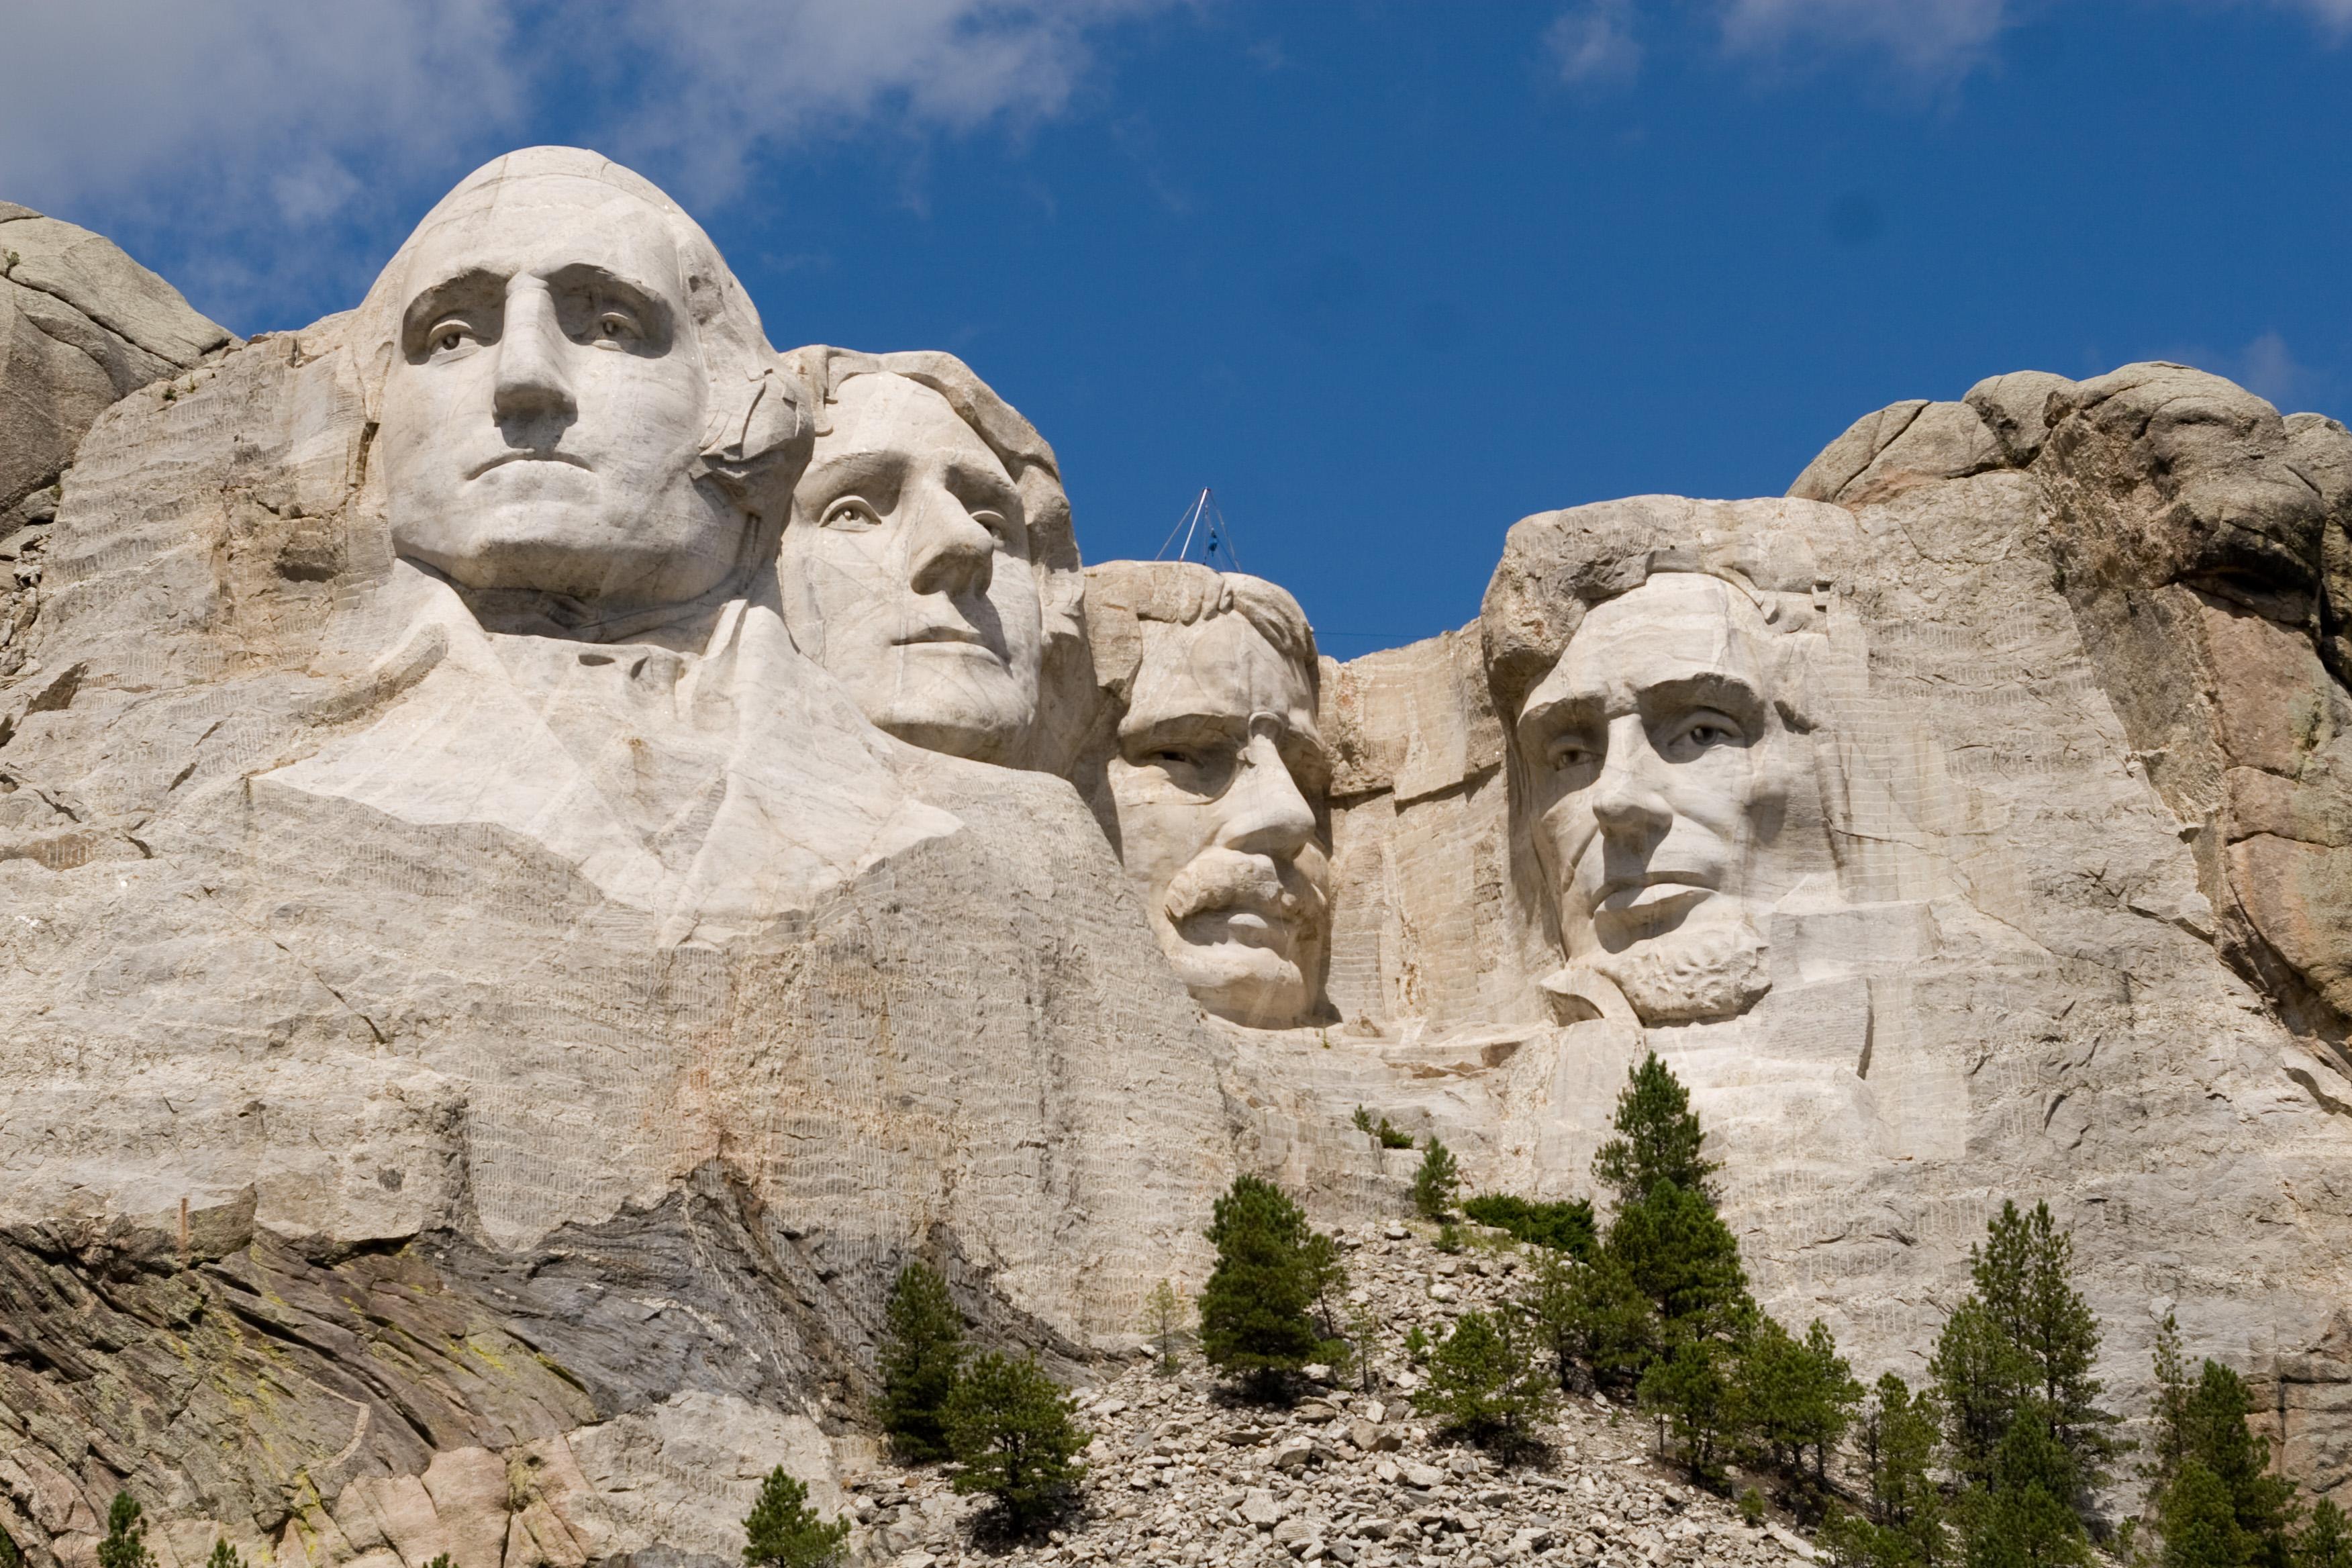 Worksheet Description Of Mount Rushmore mount rushmore by adamswi